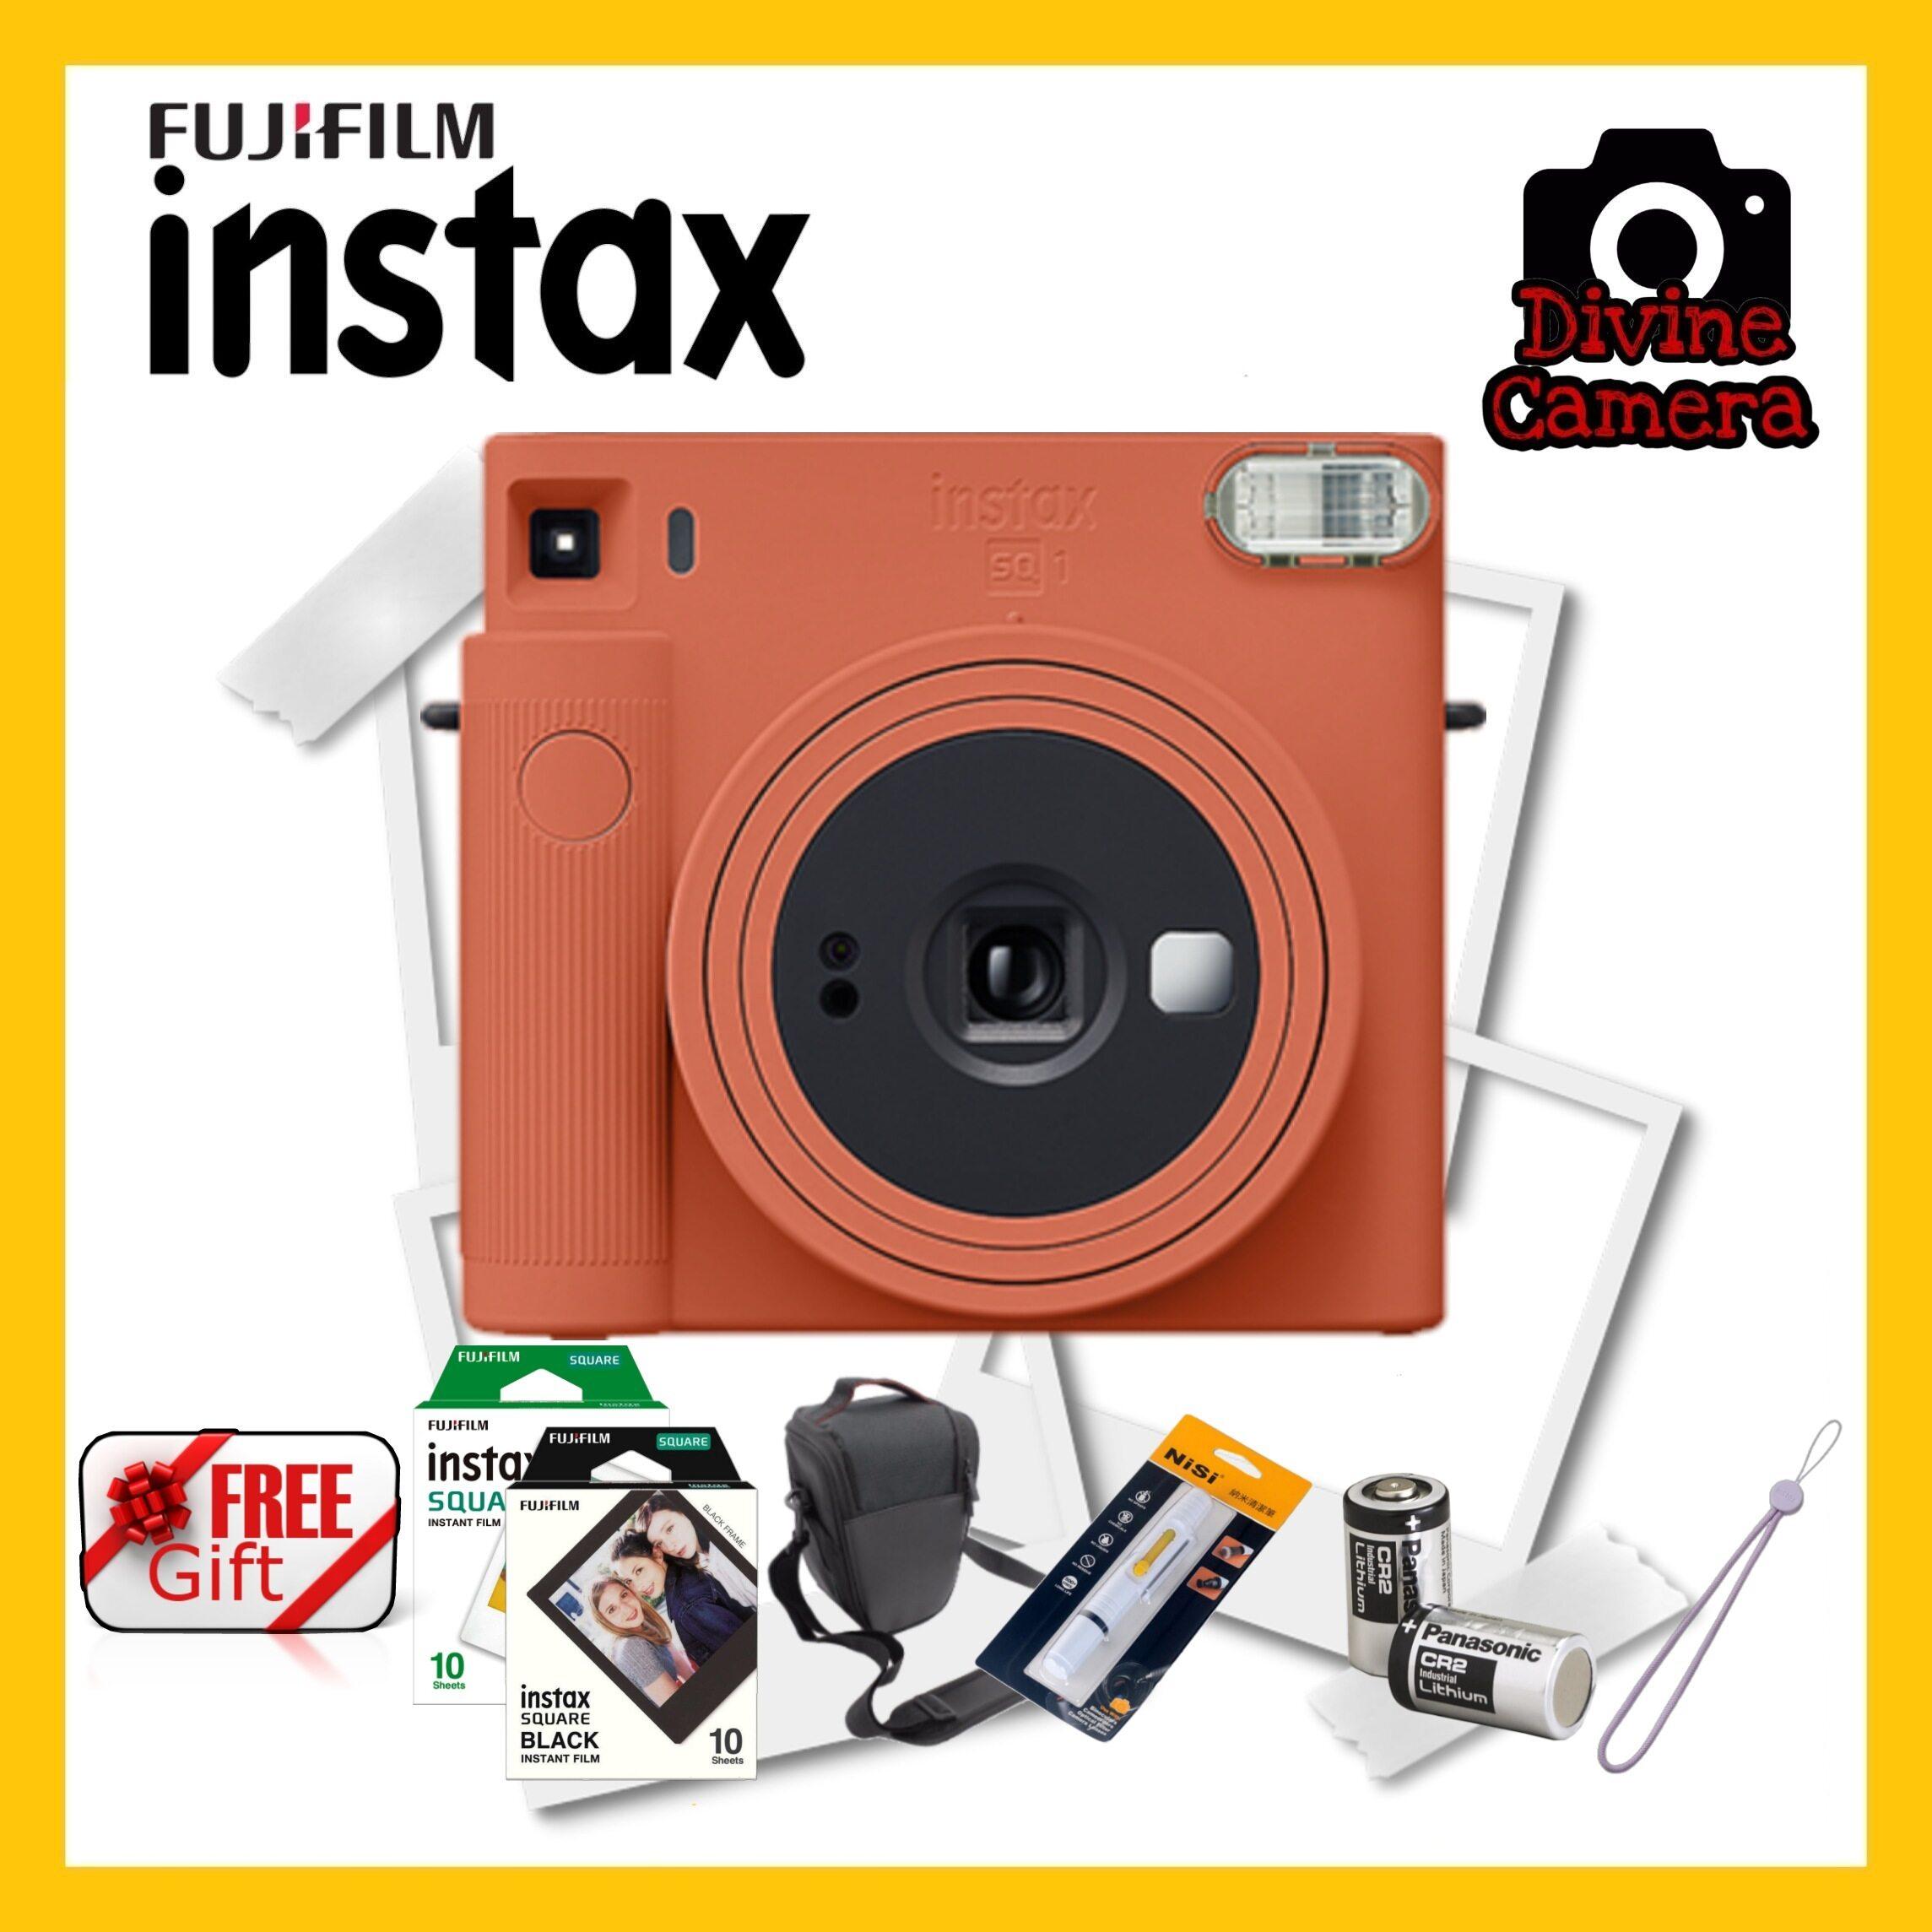 Fujifilm instax SQUARE SQ1 Instant Camera